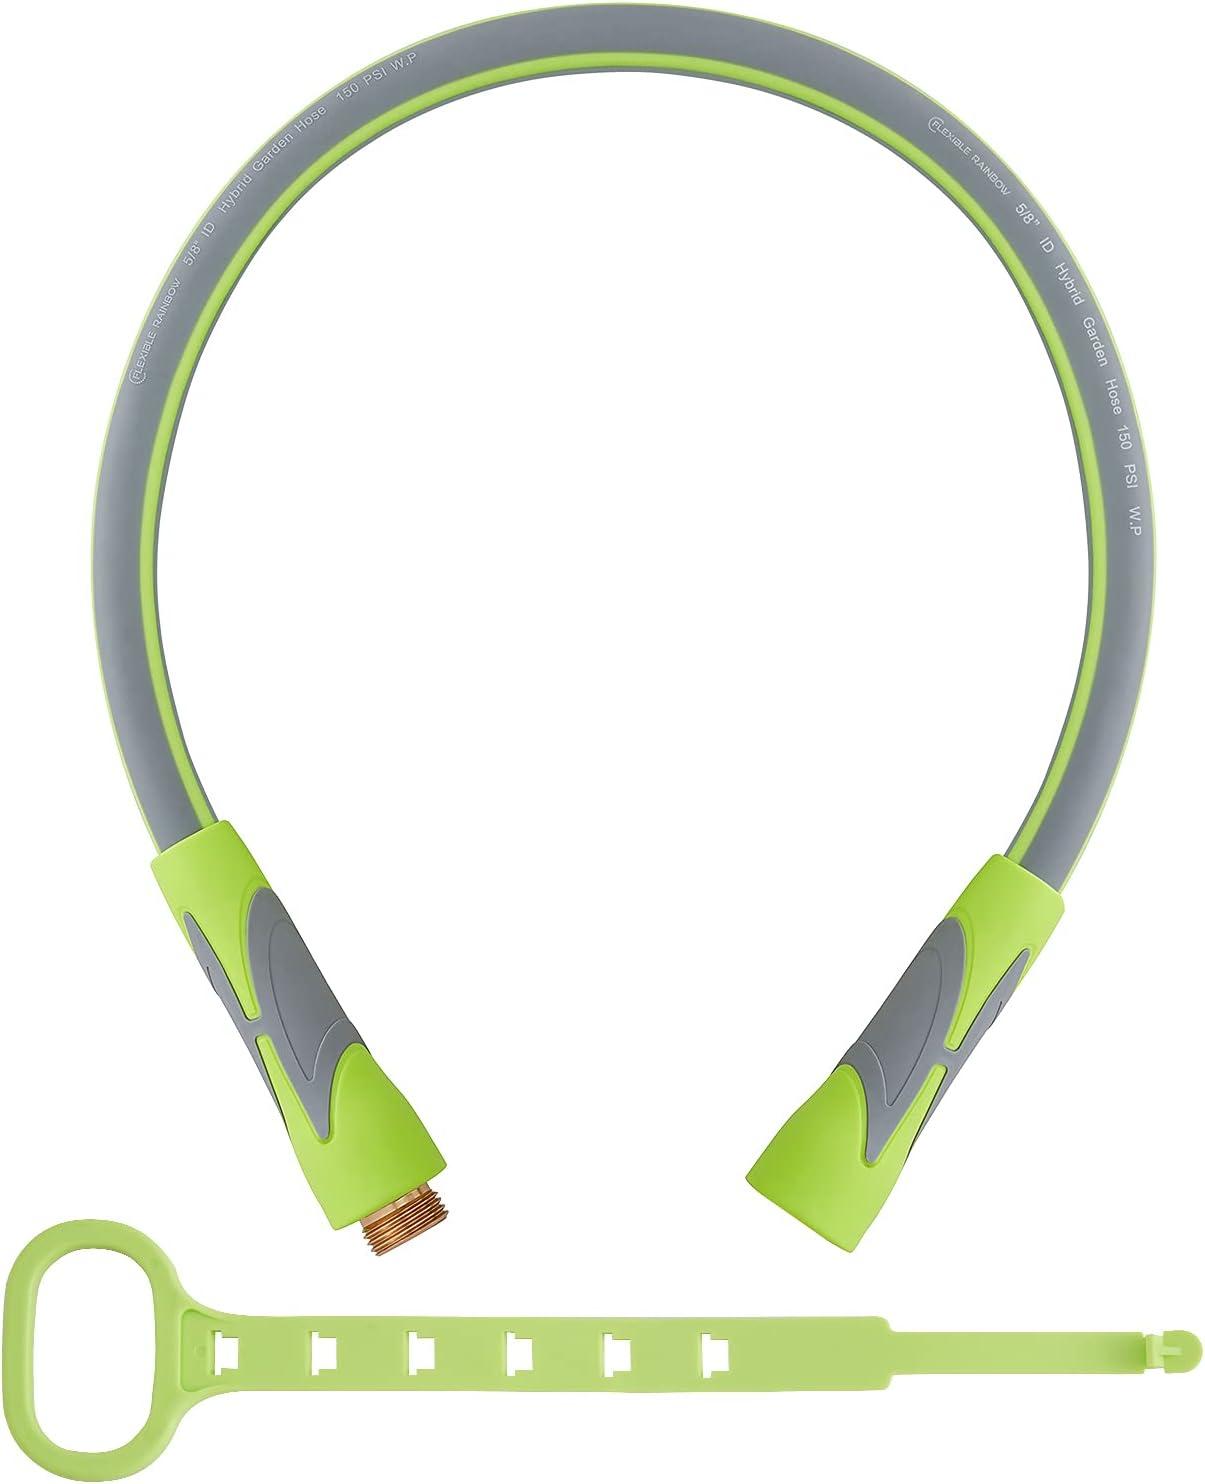 Garden Hose, Hybrid 5/8 in, Heavy Duty, Light Weight and Flexible Water Hose (Green, 3' (feet))